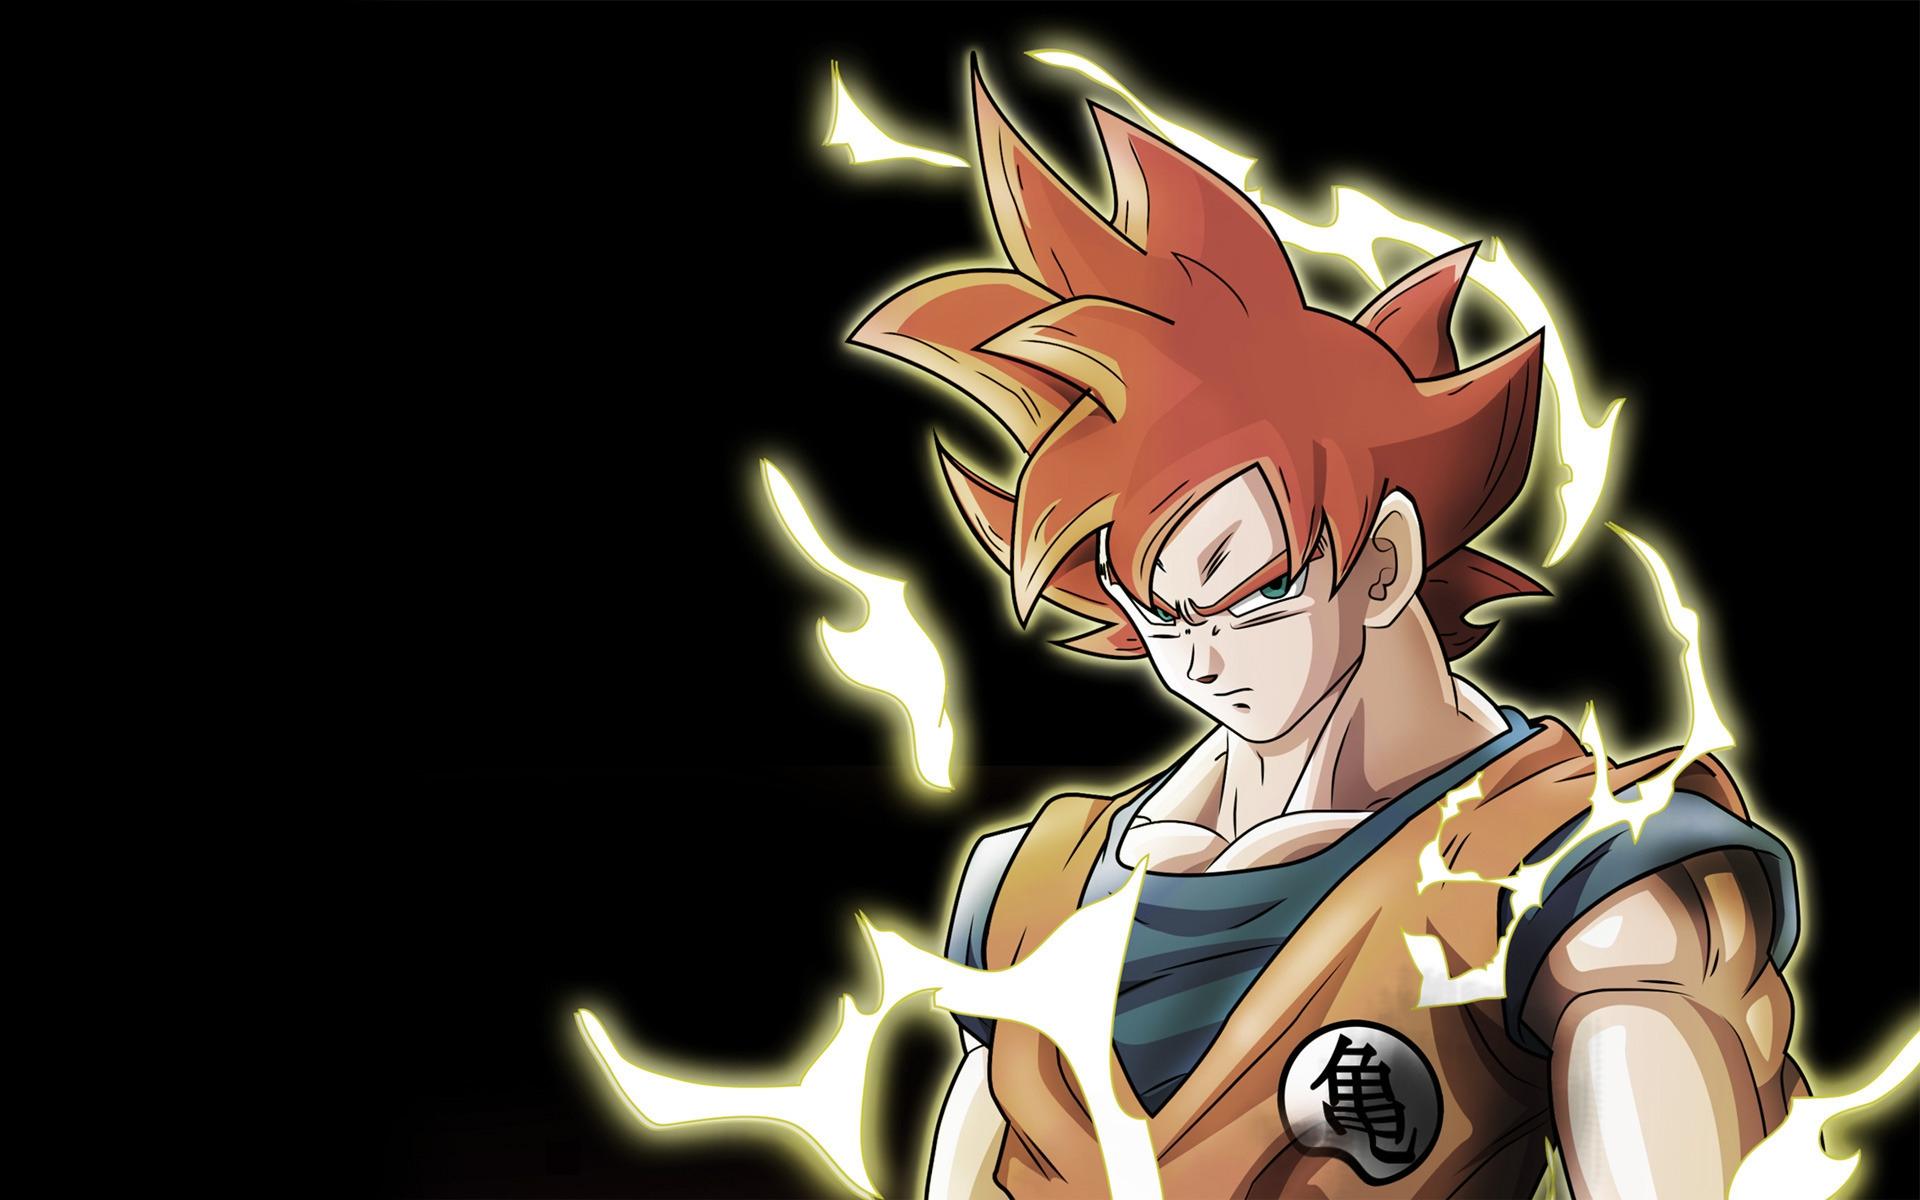 HD Goku Dragon Ball Z Backgrounds 1920x1200